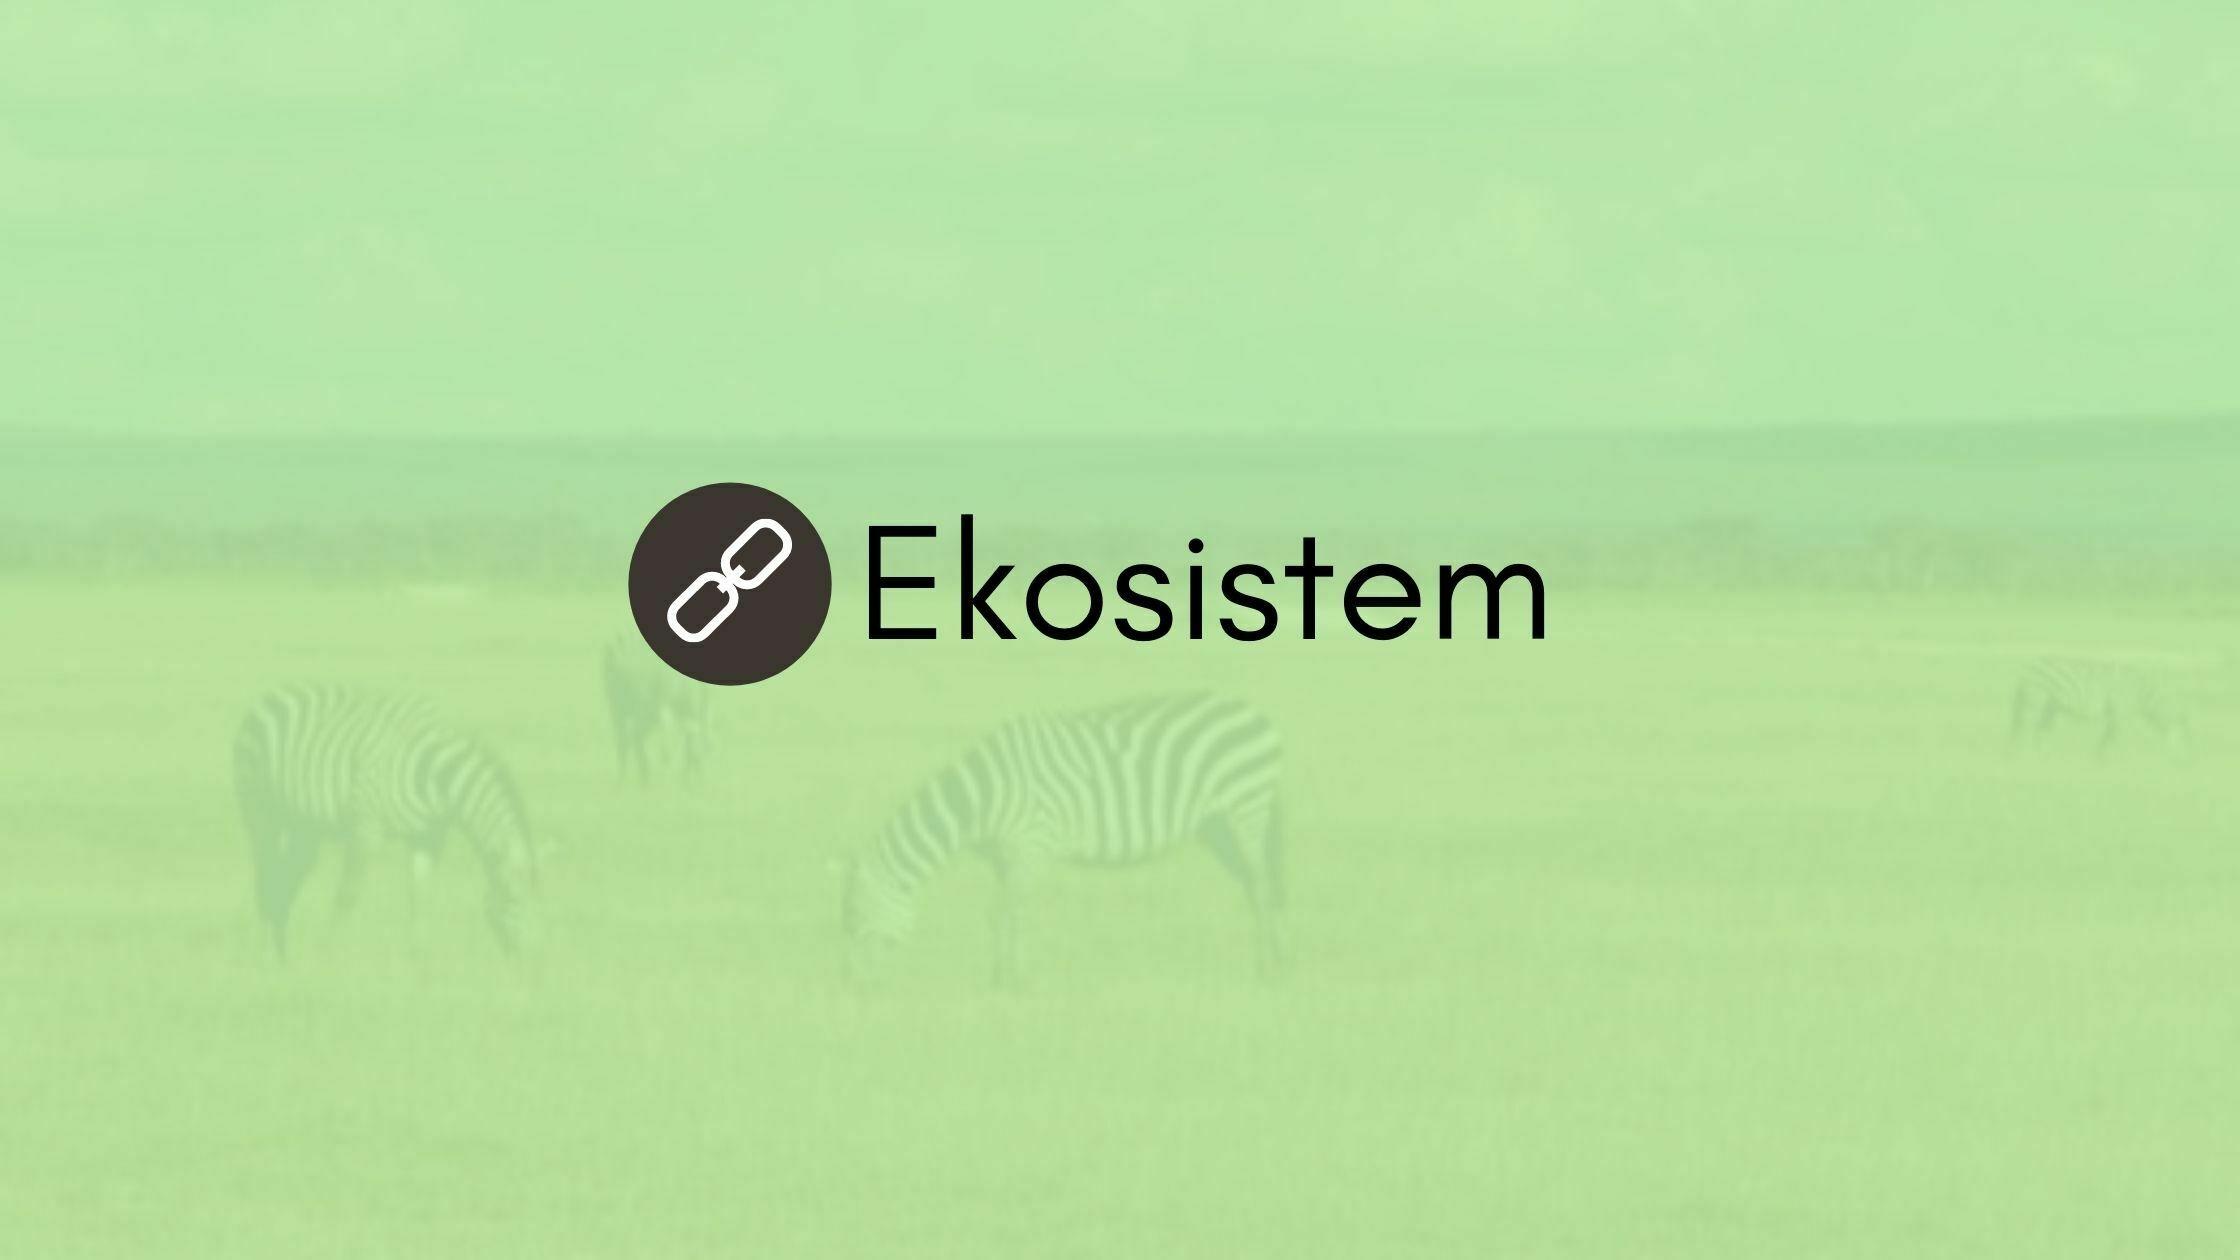 Pengertian Ekosistem, Contoh, Komponen, dan Macam-Macamnya